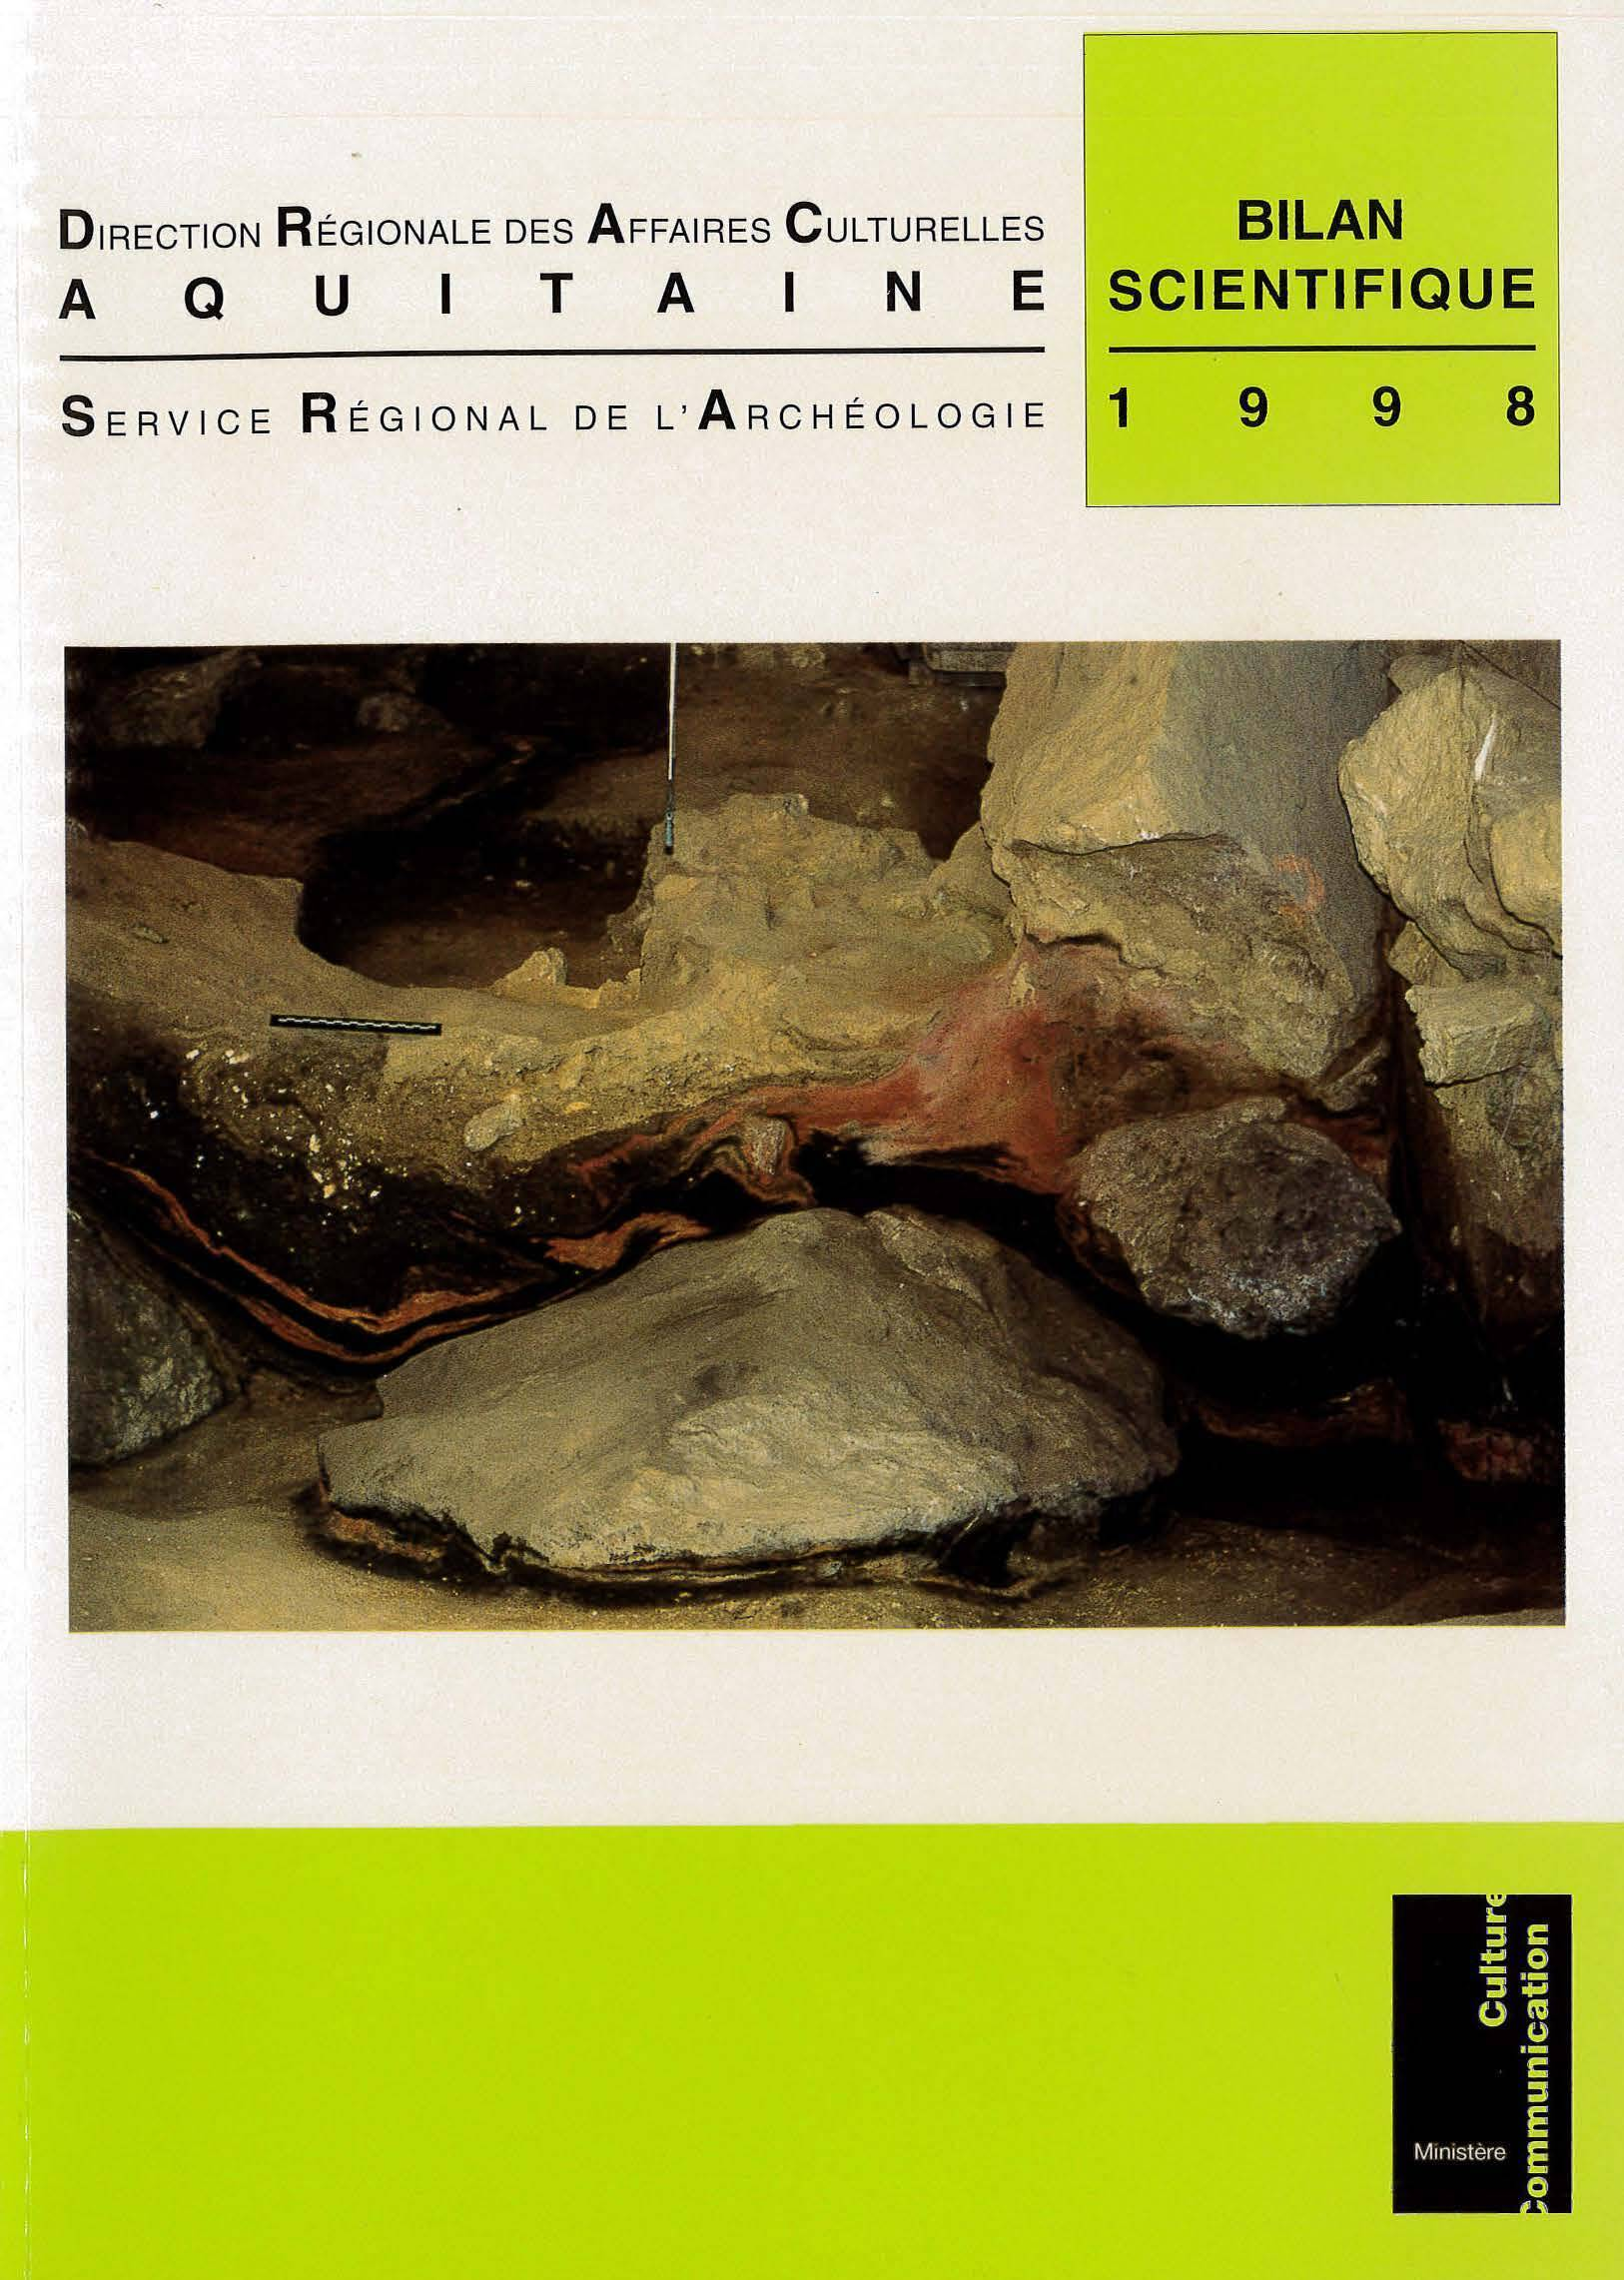 BSR 1998